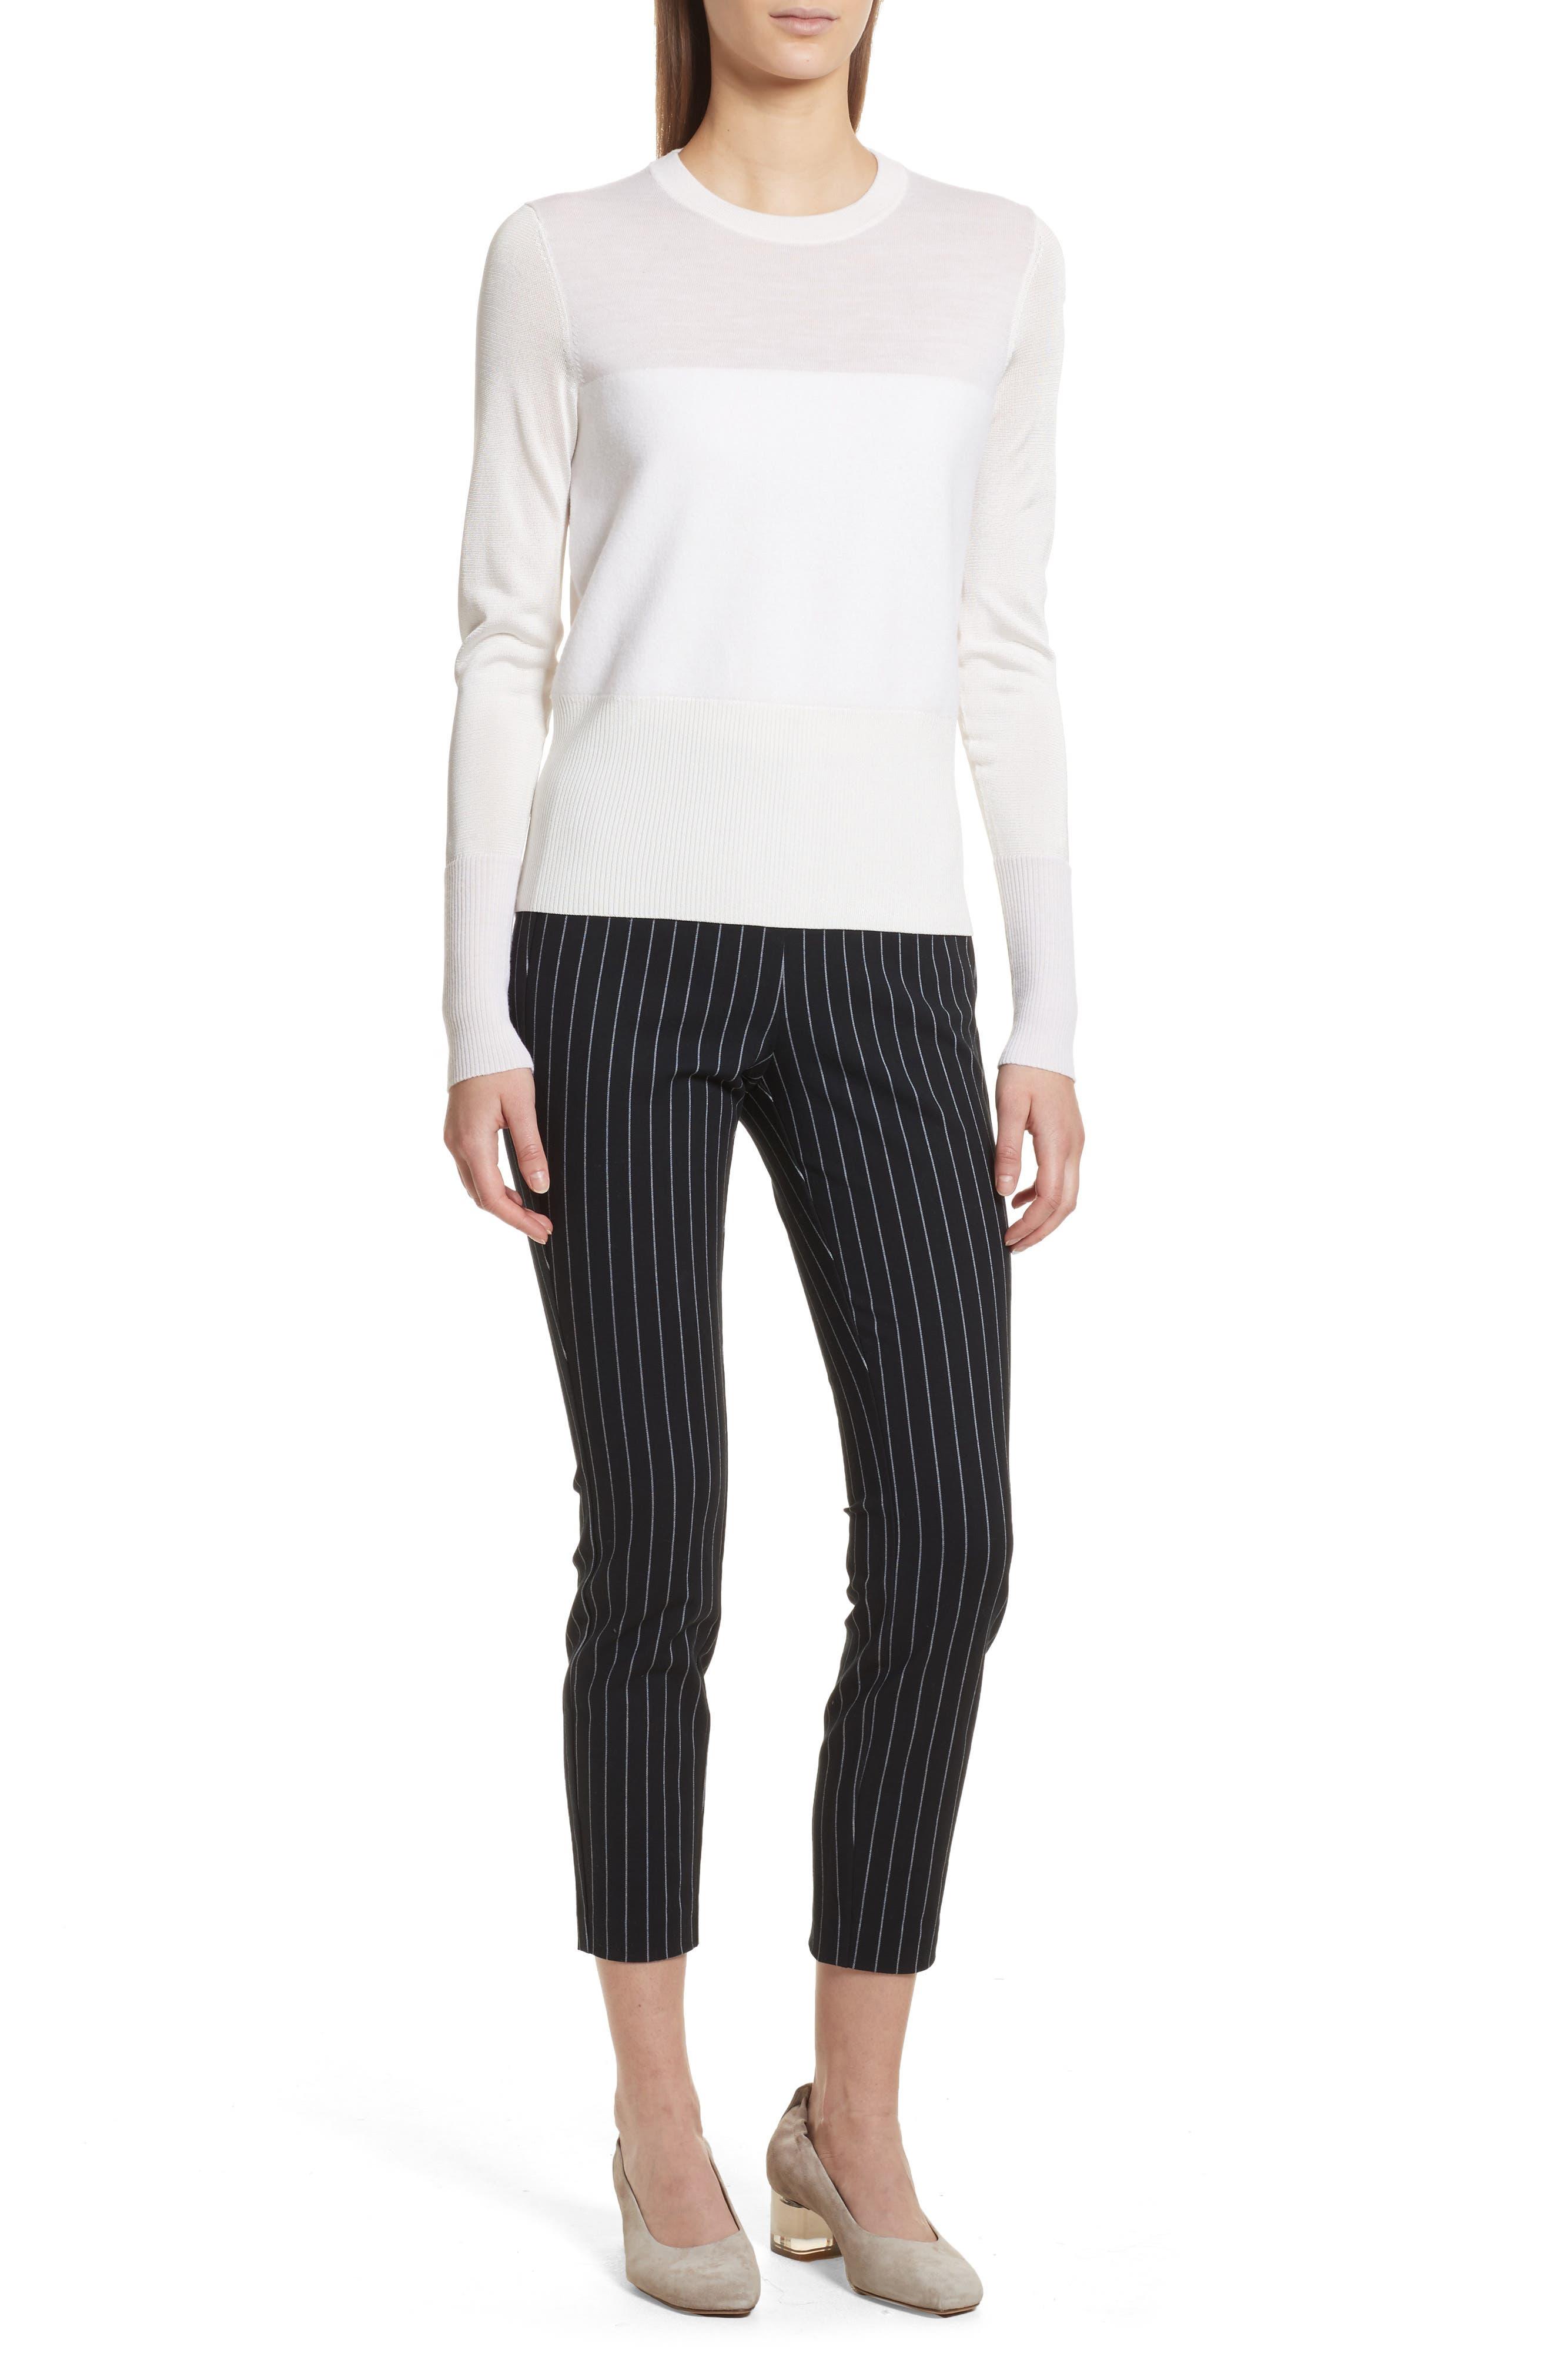 Simone Pinstripe Pants,                             Alternate thumbnail 6, color,                             Black/ White